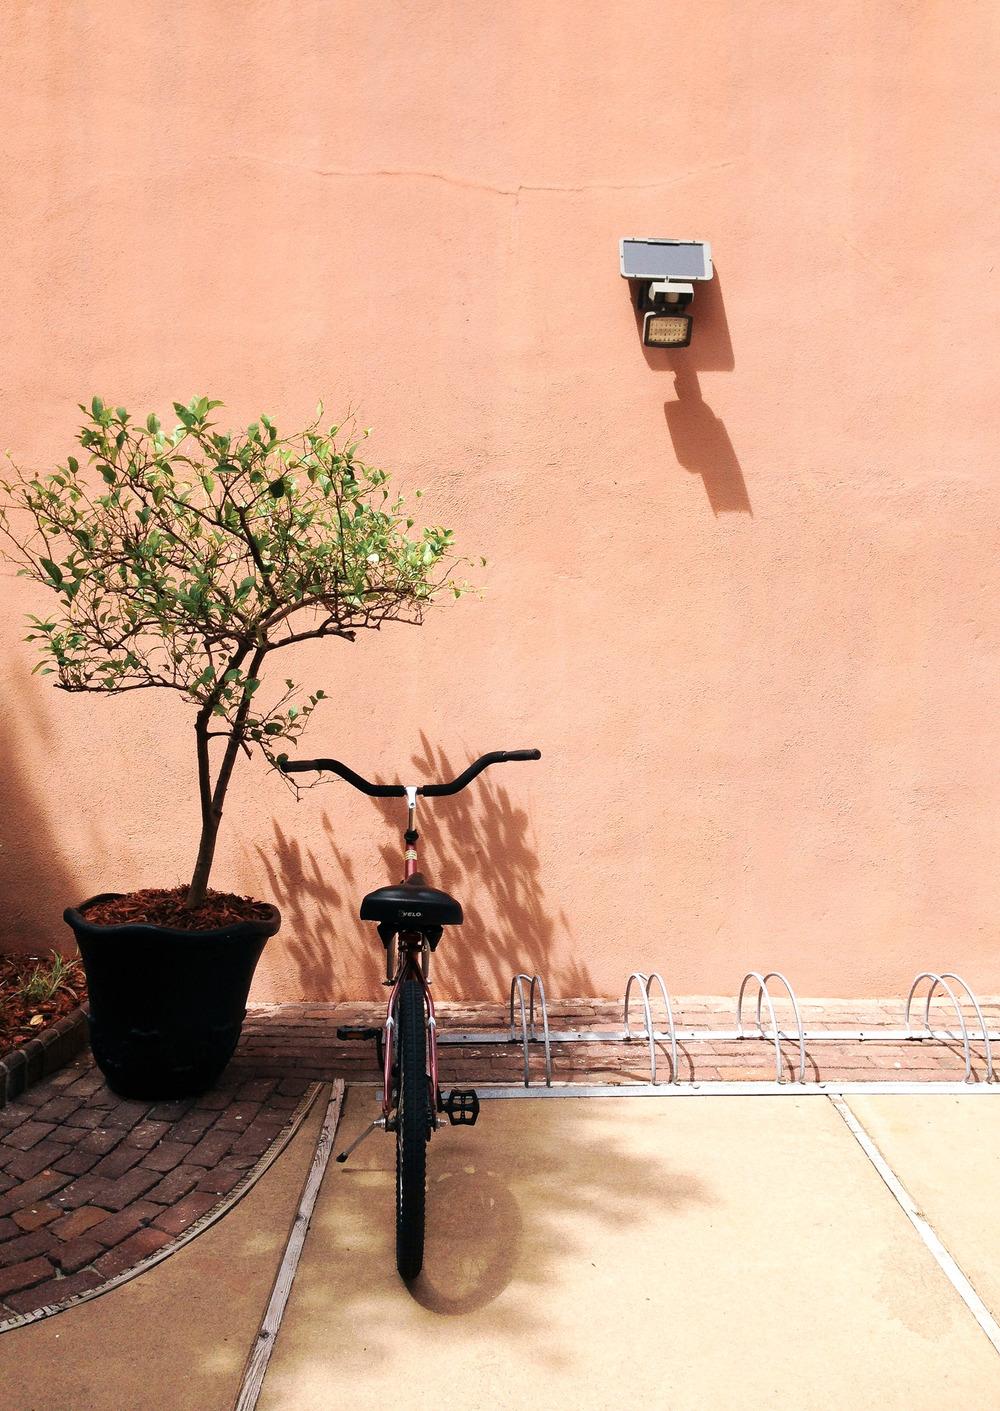 Street_shadows-2269.jpg